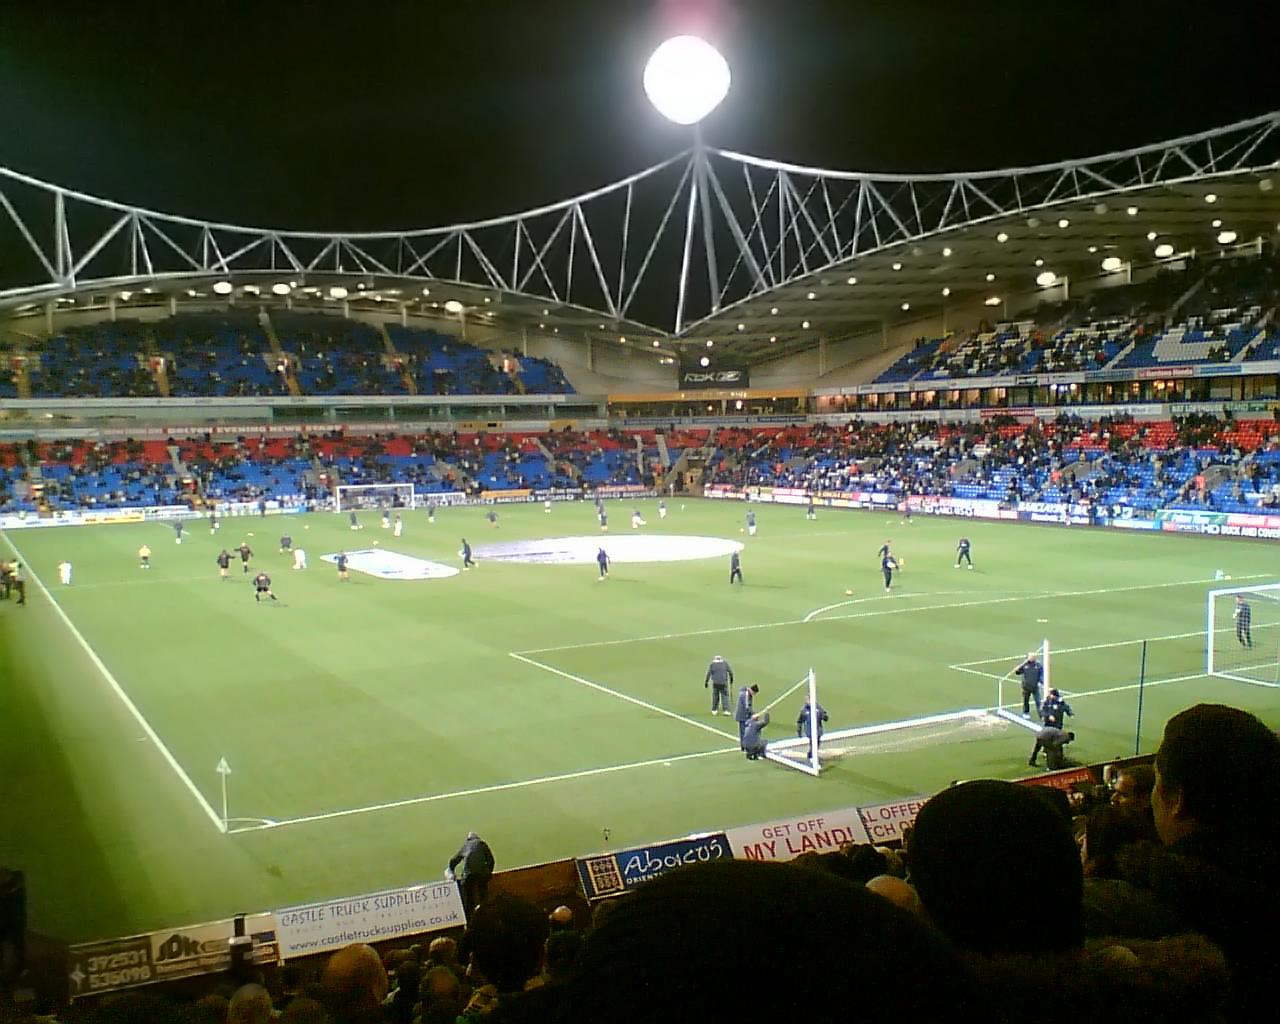 http://upload.wikimedia.org/wikipedia/commons/1/11/Reebok_Stadium.jpg